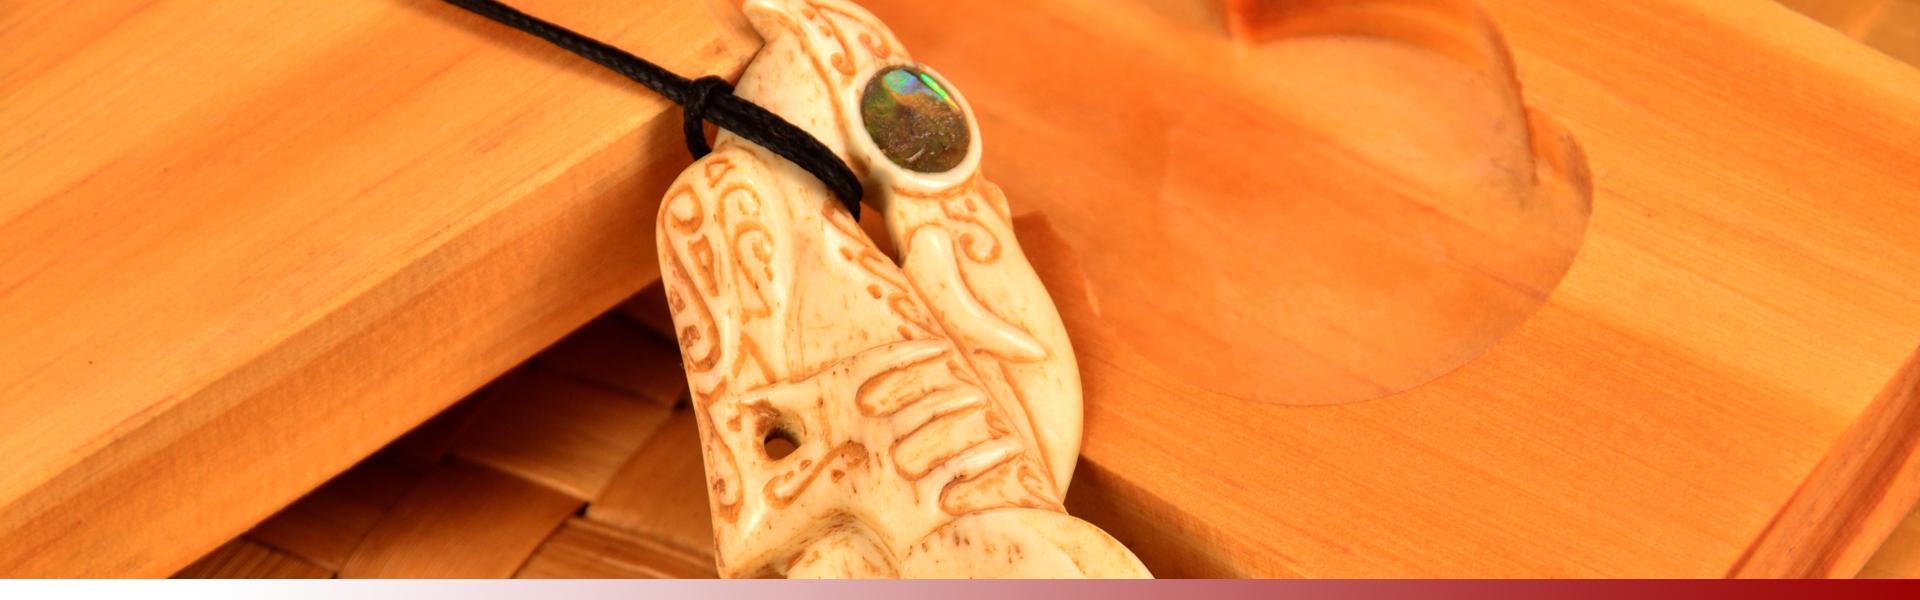 Taniwha bone carving